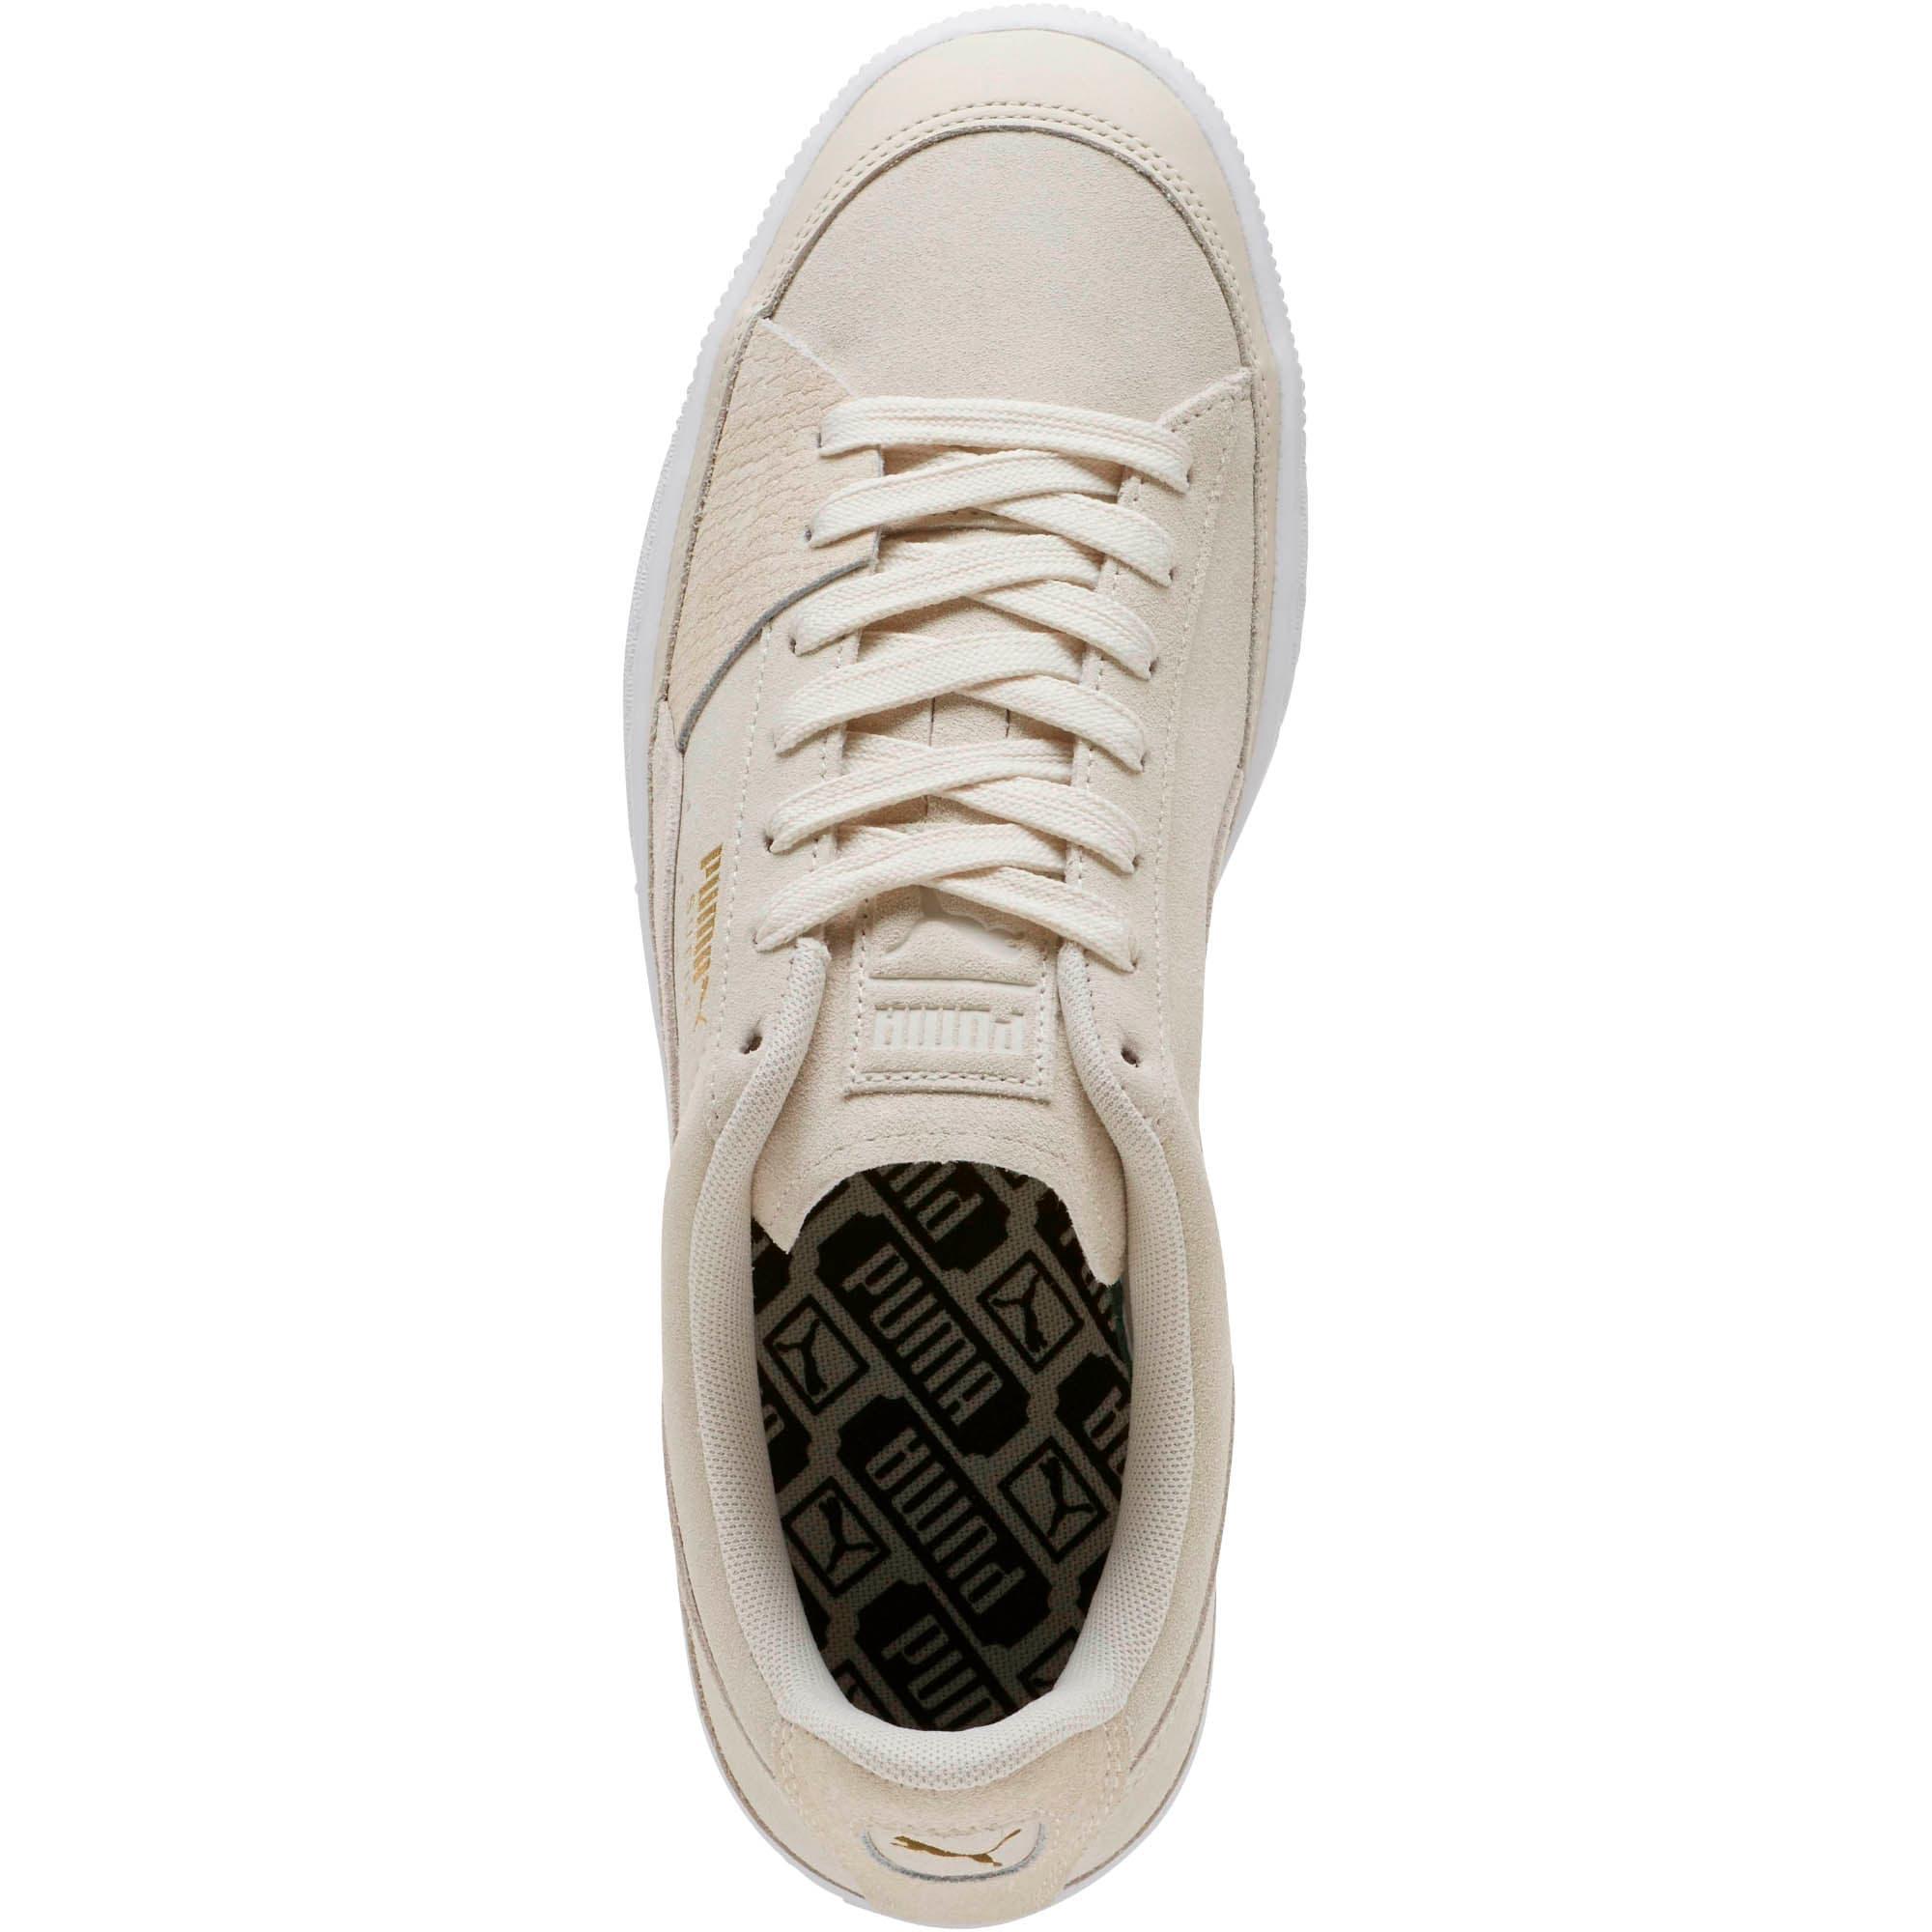 Thumbnail 5 of Suede Skate Premium Sneakers, Whisper White-Puma White, medium